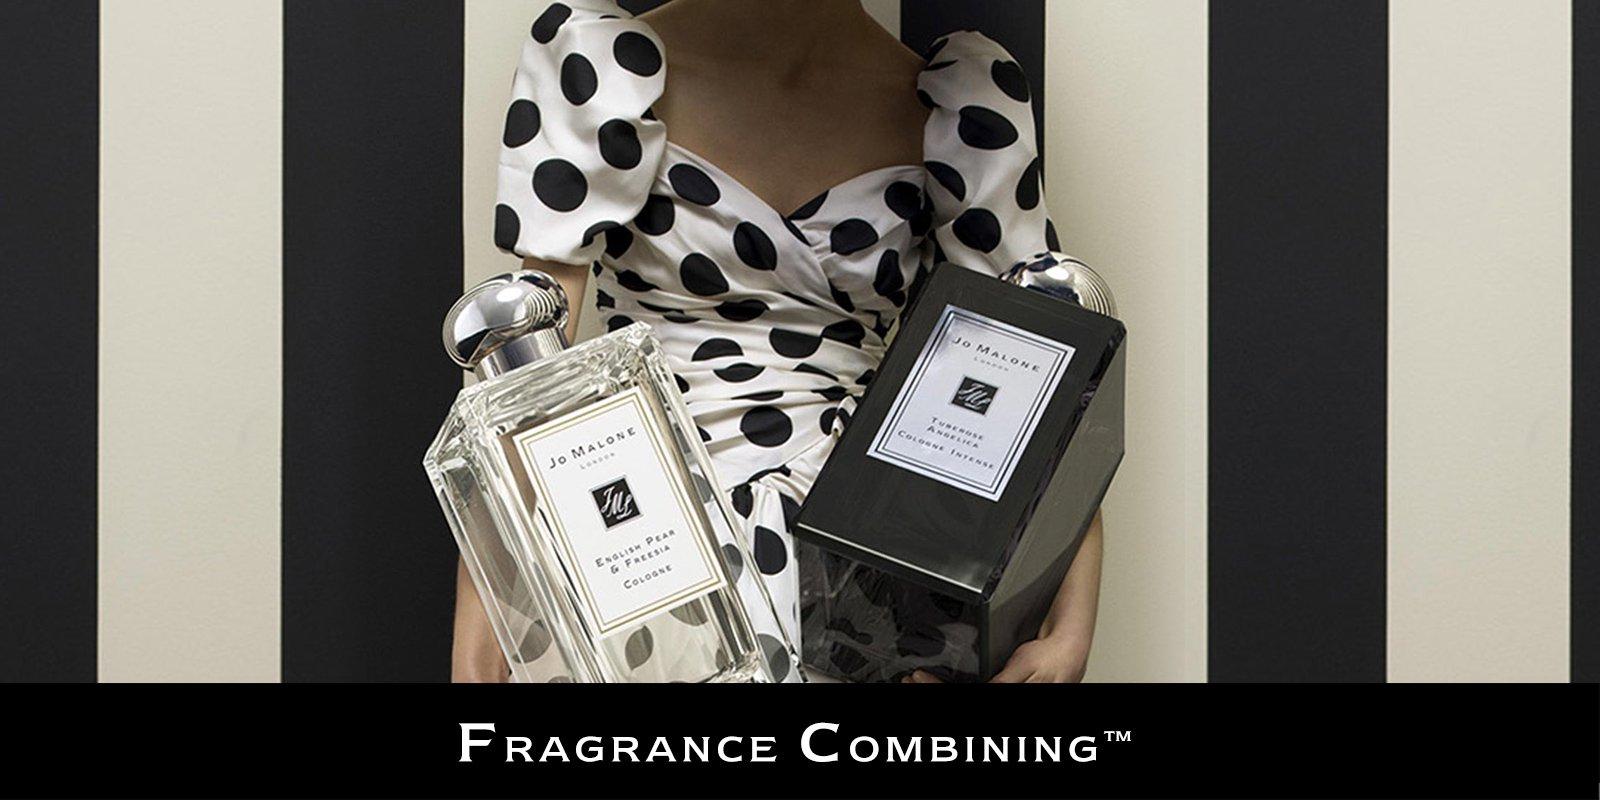 Jo Malone London - Fragrance Combining™